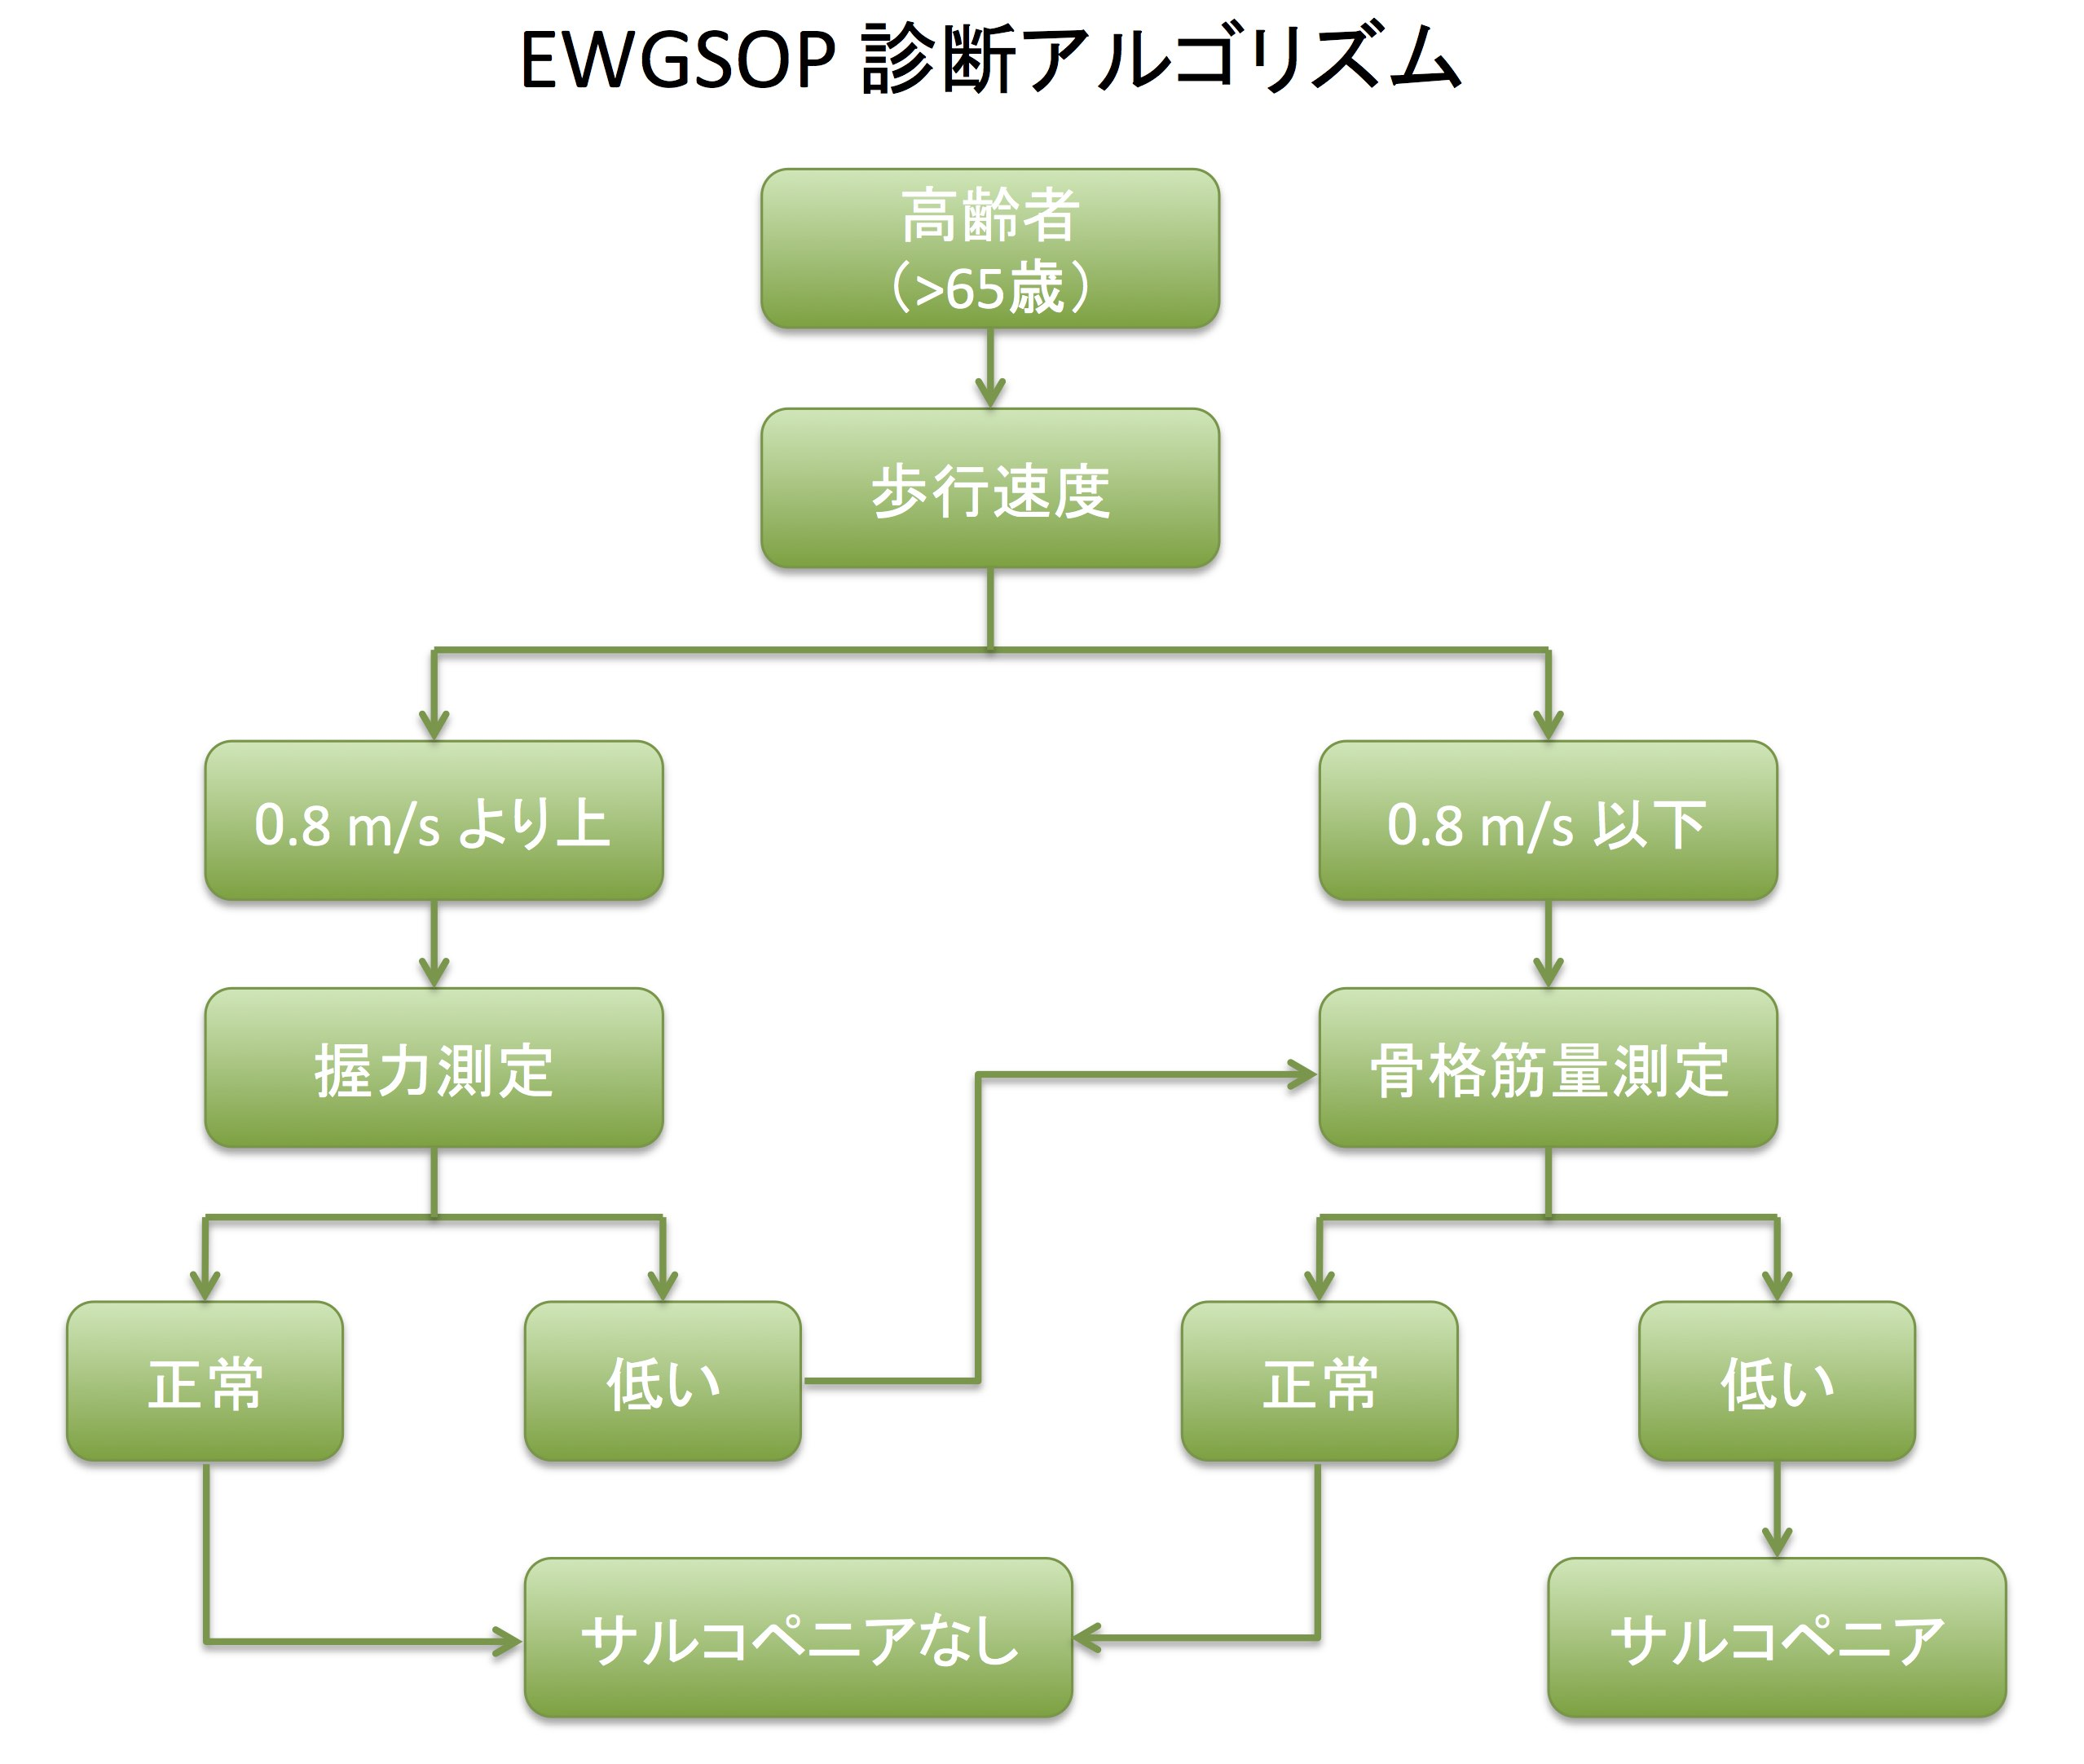 EWGSOP診断アルゴリズム